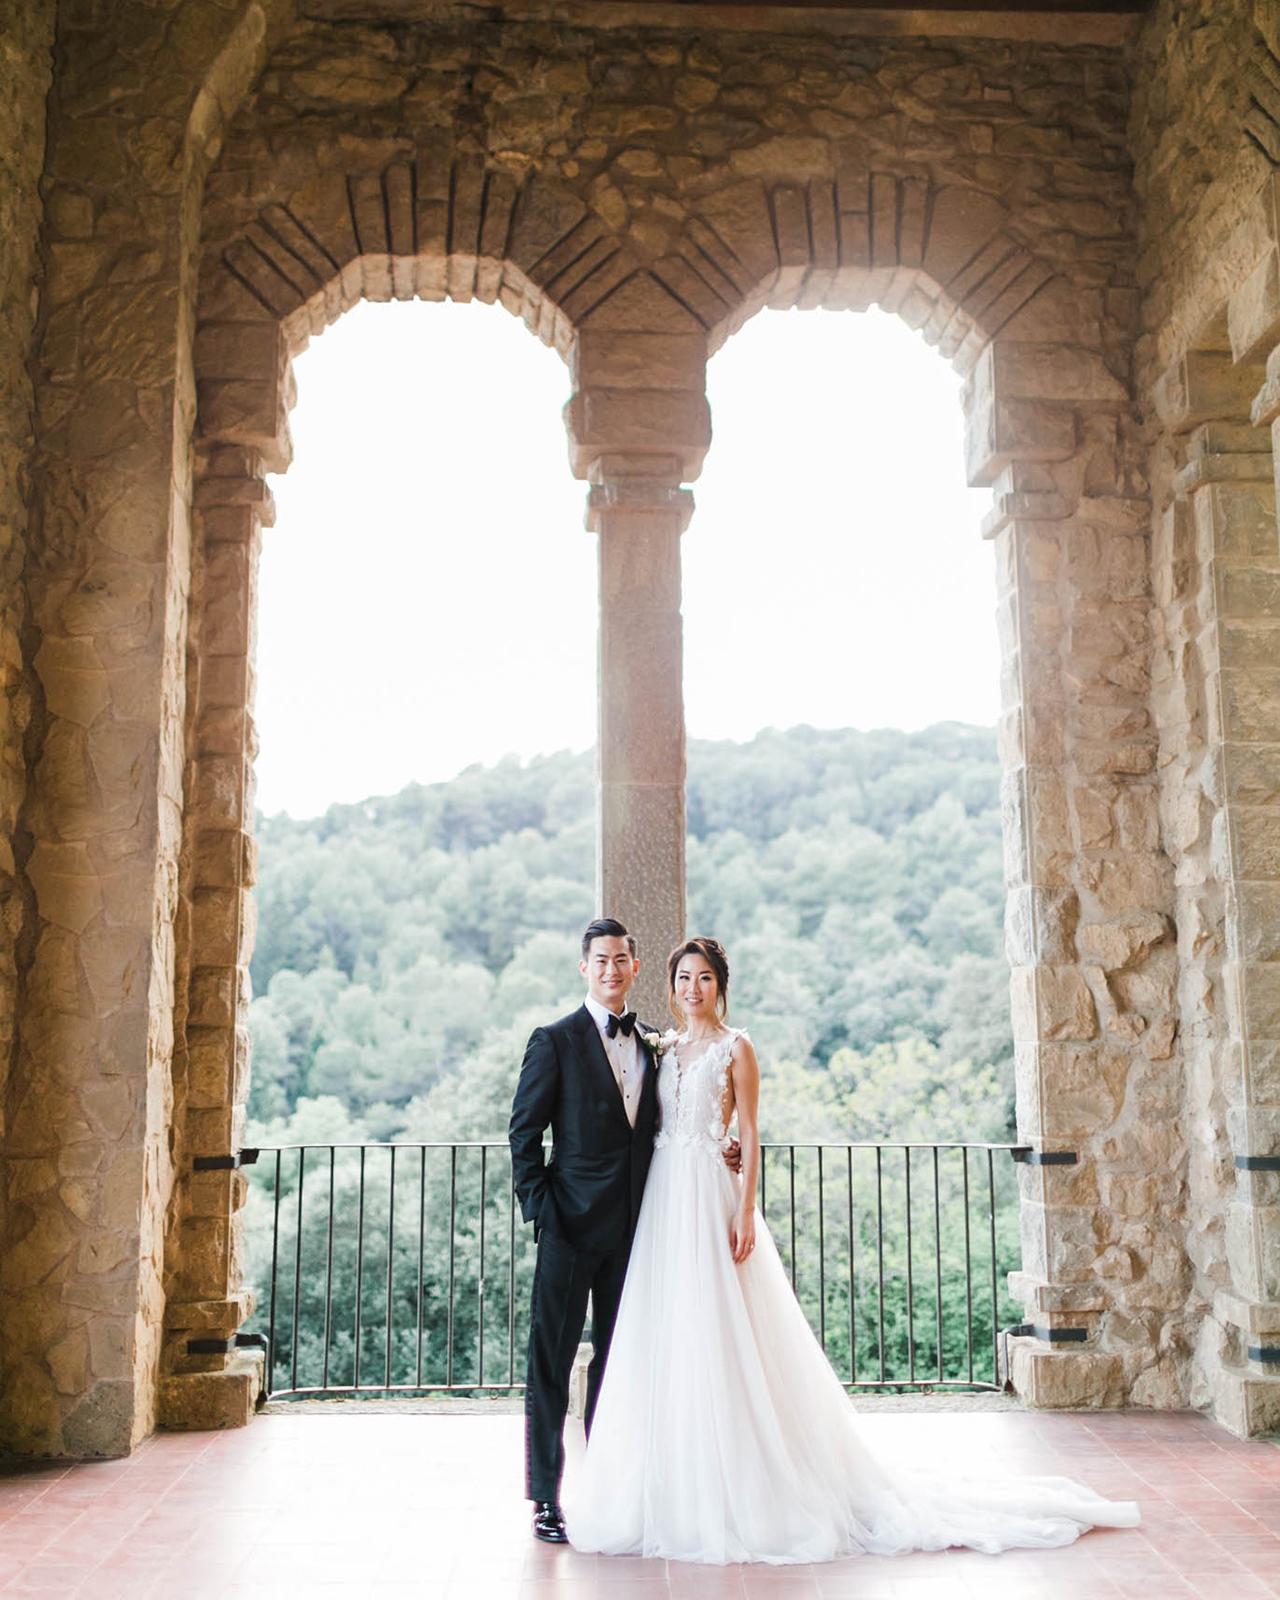 One Couple's Elegant Destination Wedding in Spain's Montserrat Mountains